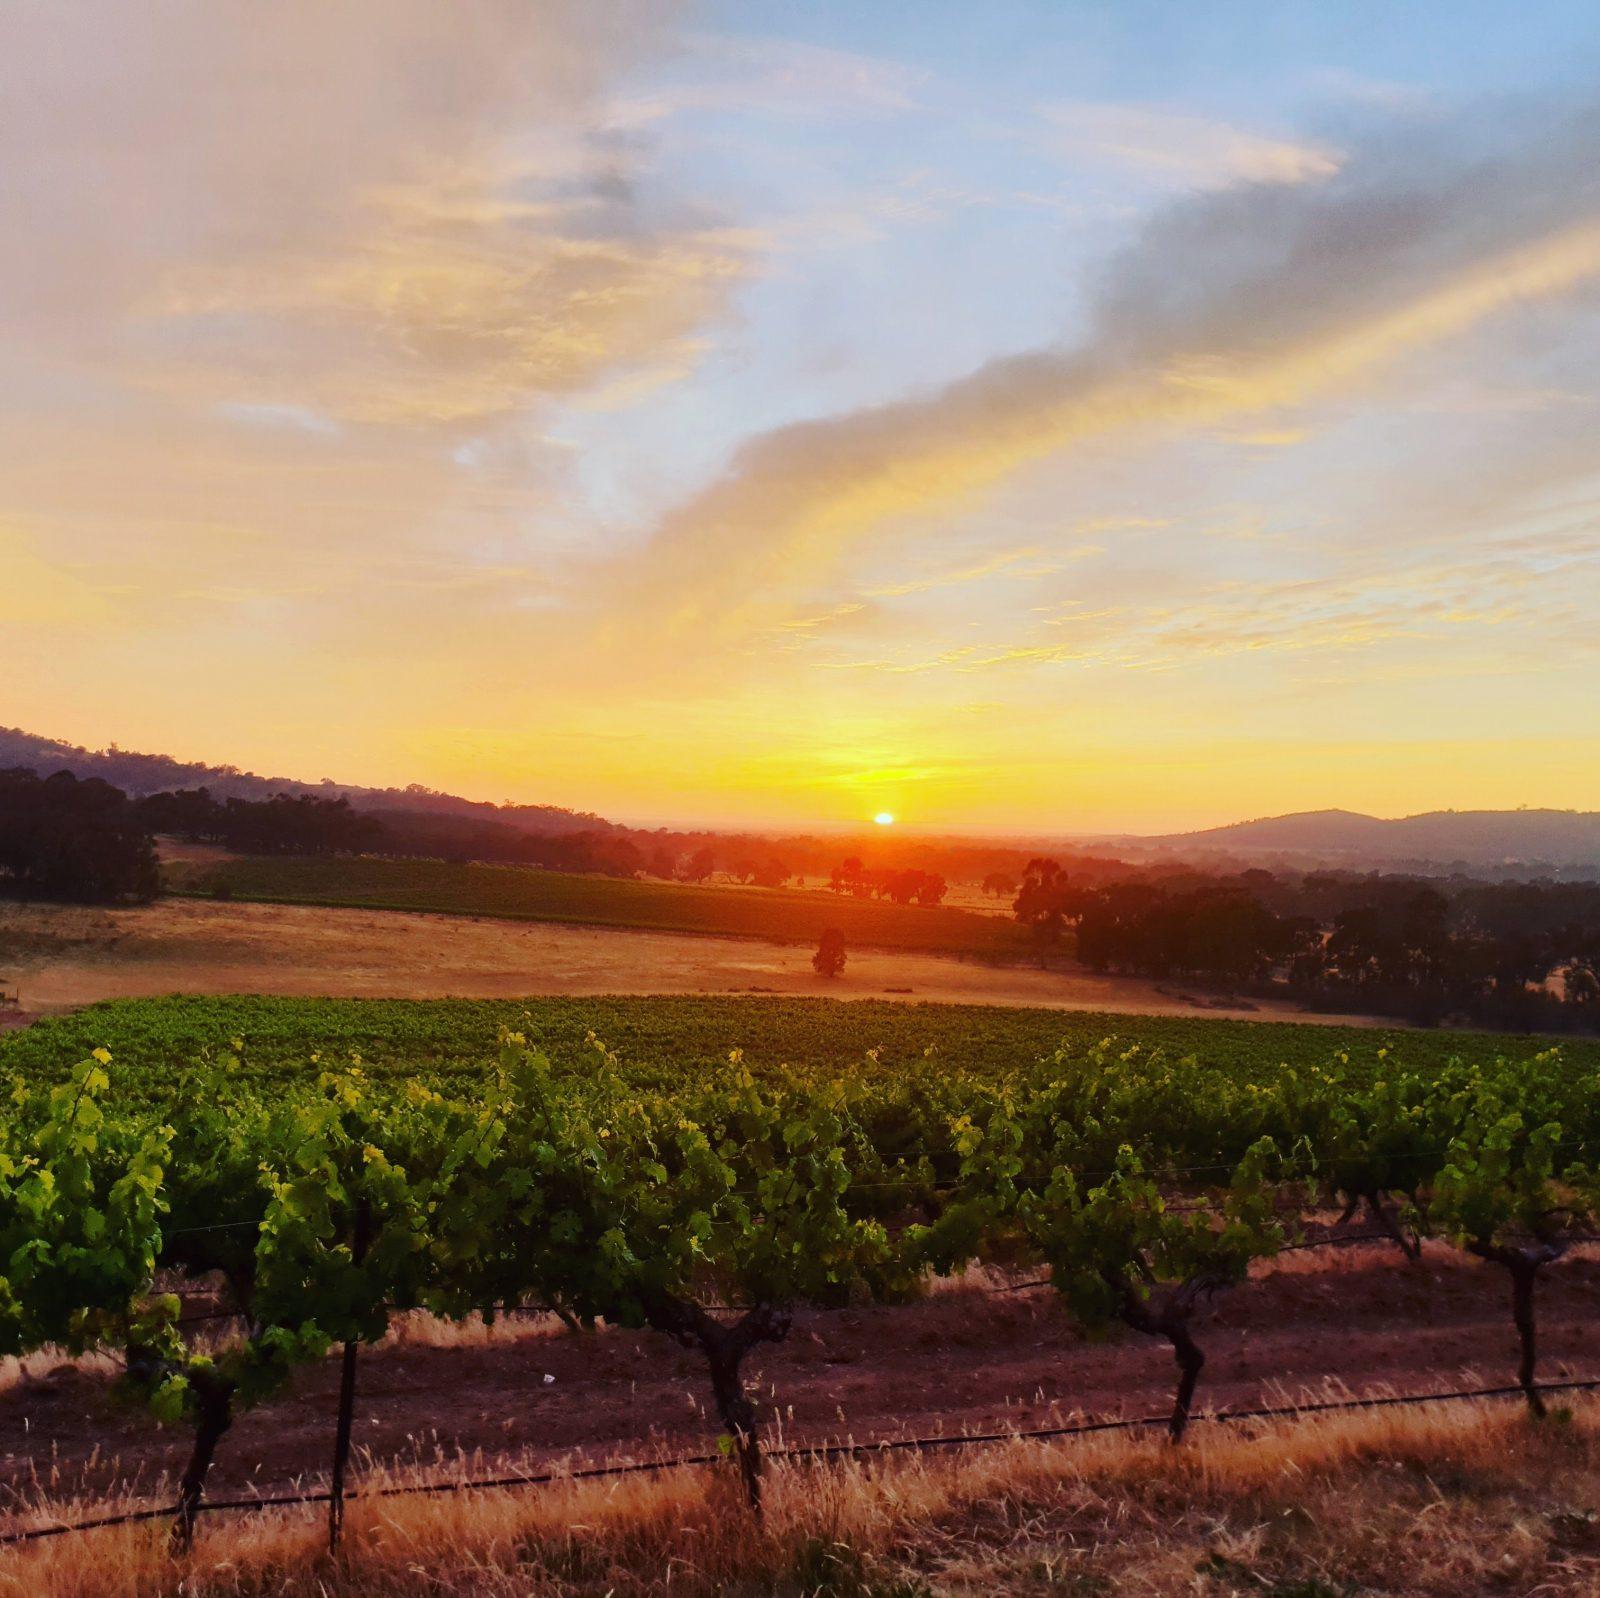 Sunrise over the vines